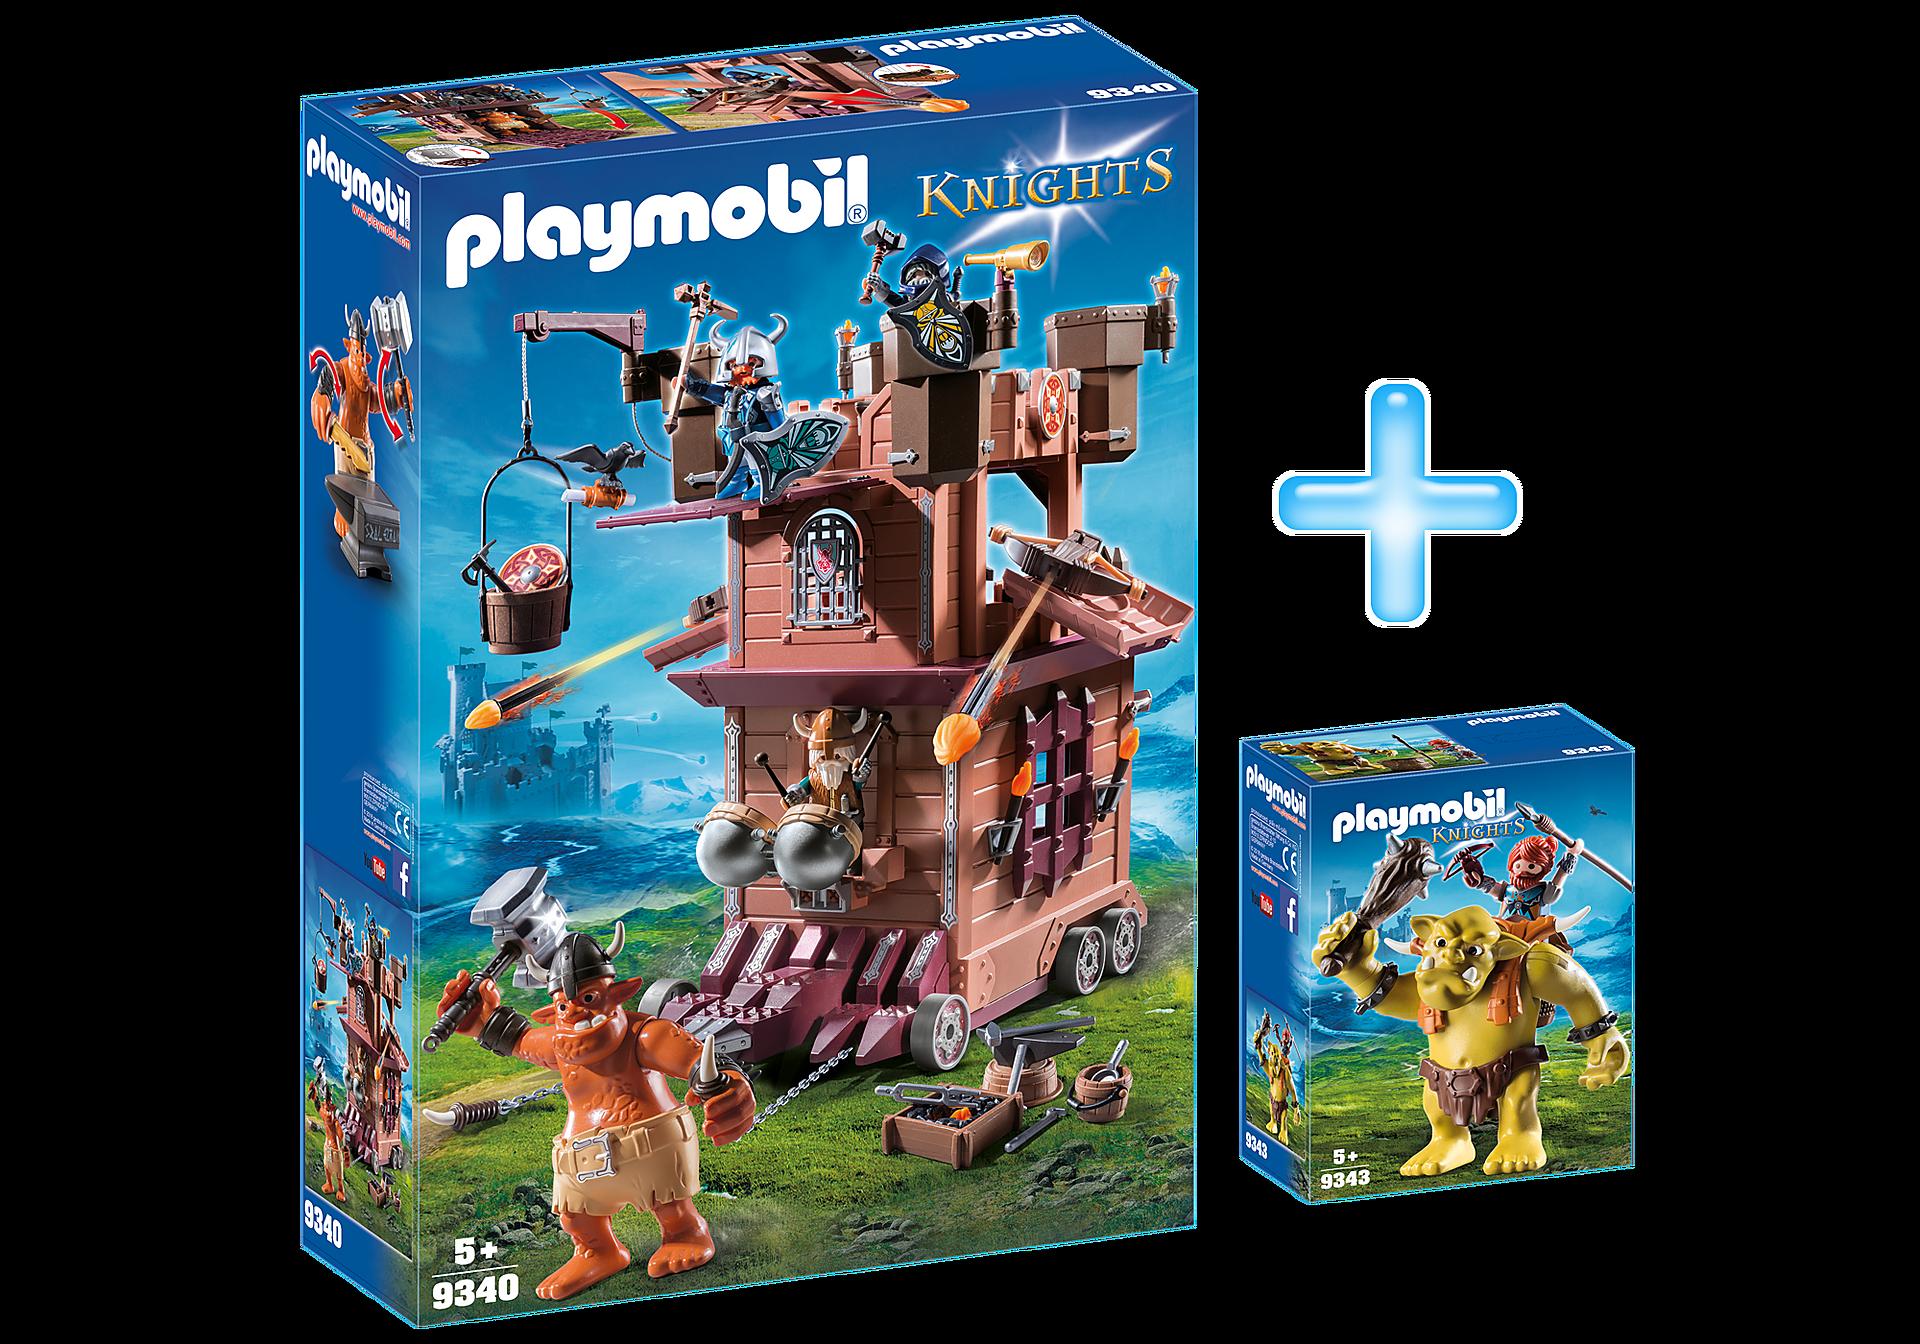 http://media.playmobil.com/i/playmobil/PM1909K_product_detail/Playmobil Dwarfs Bundle